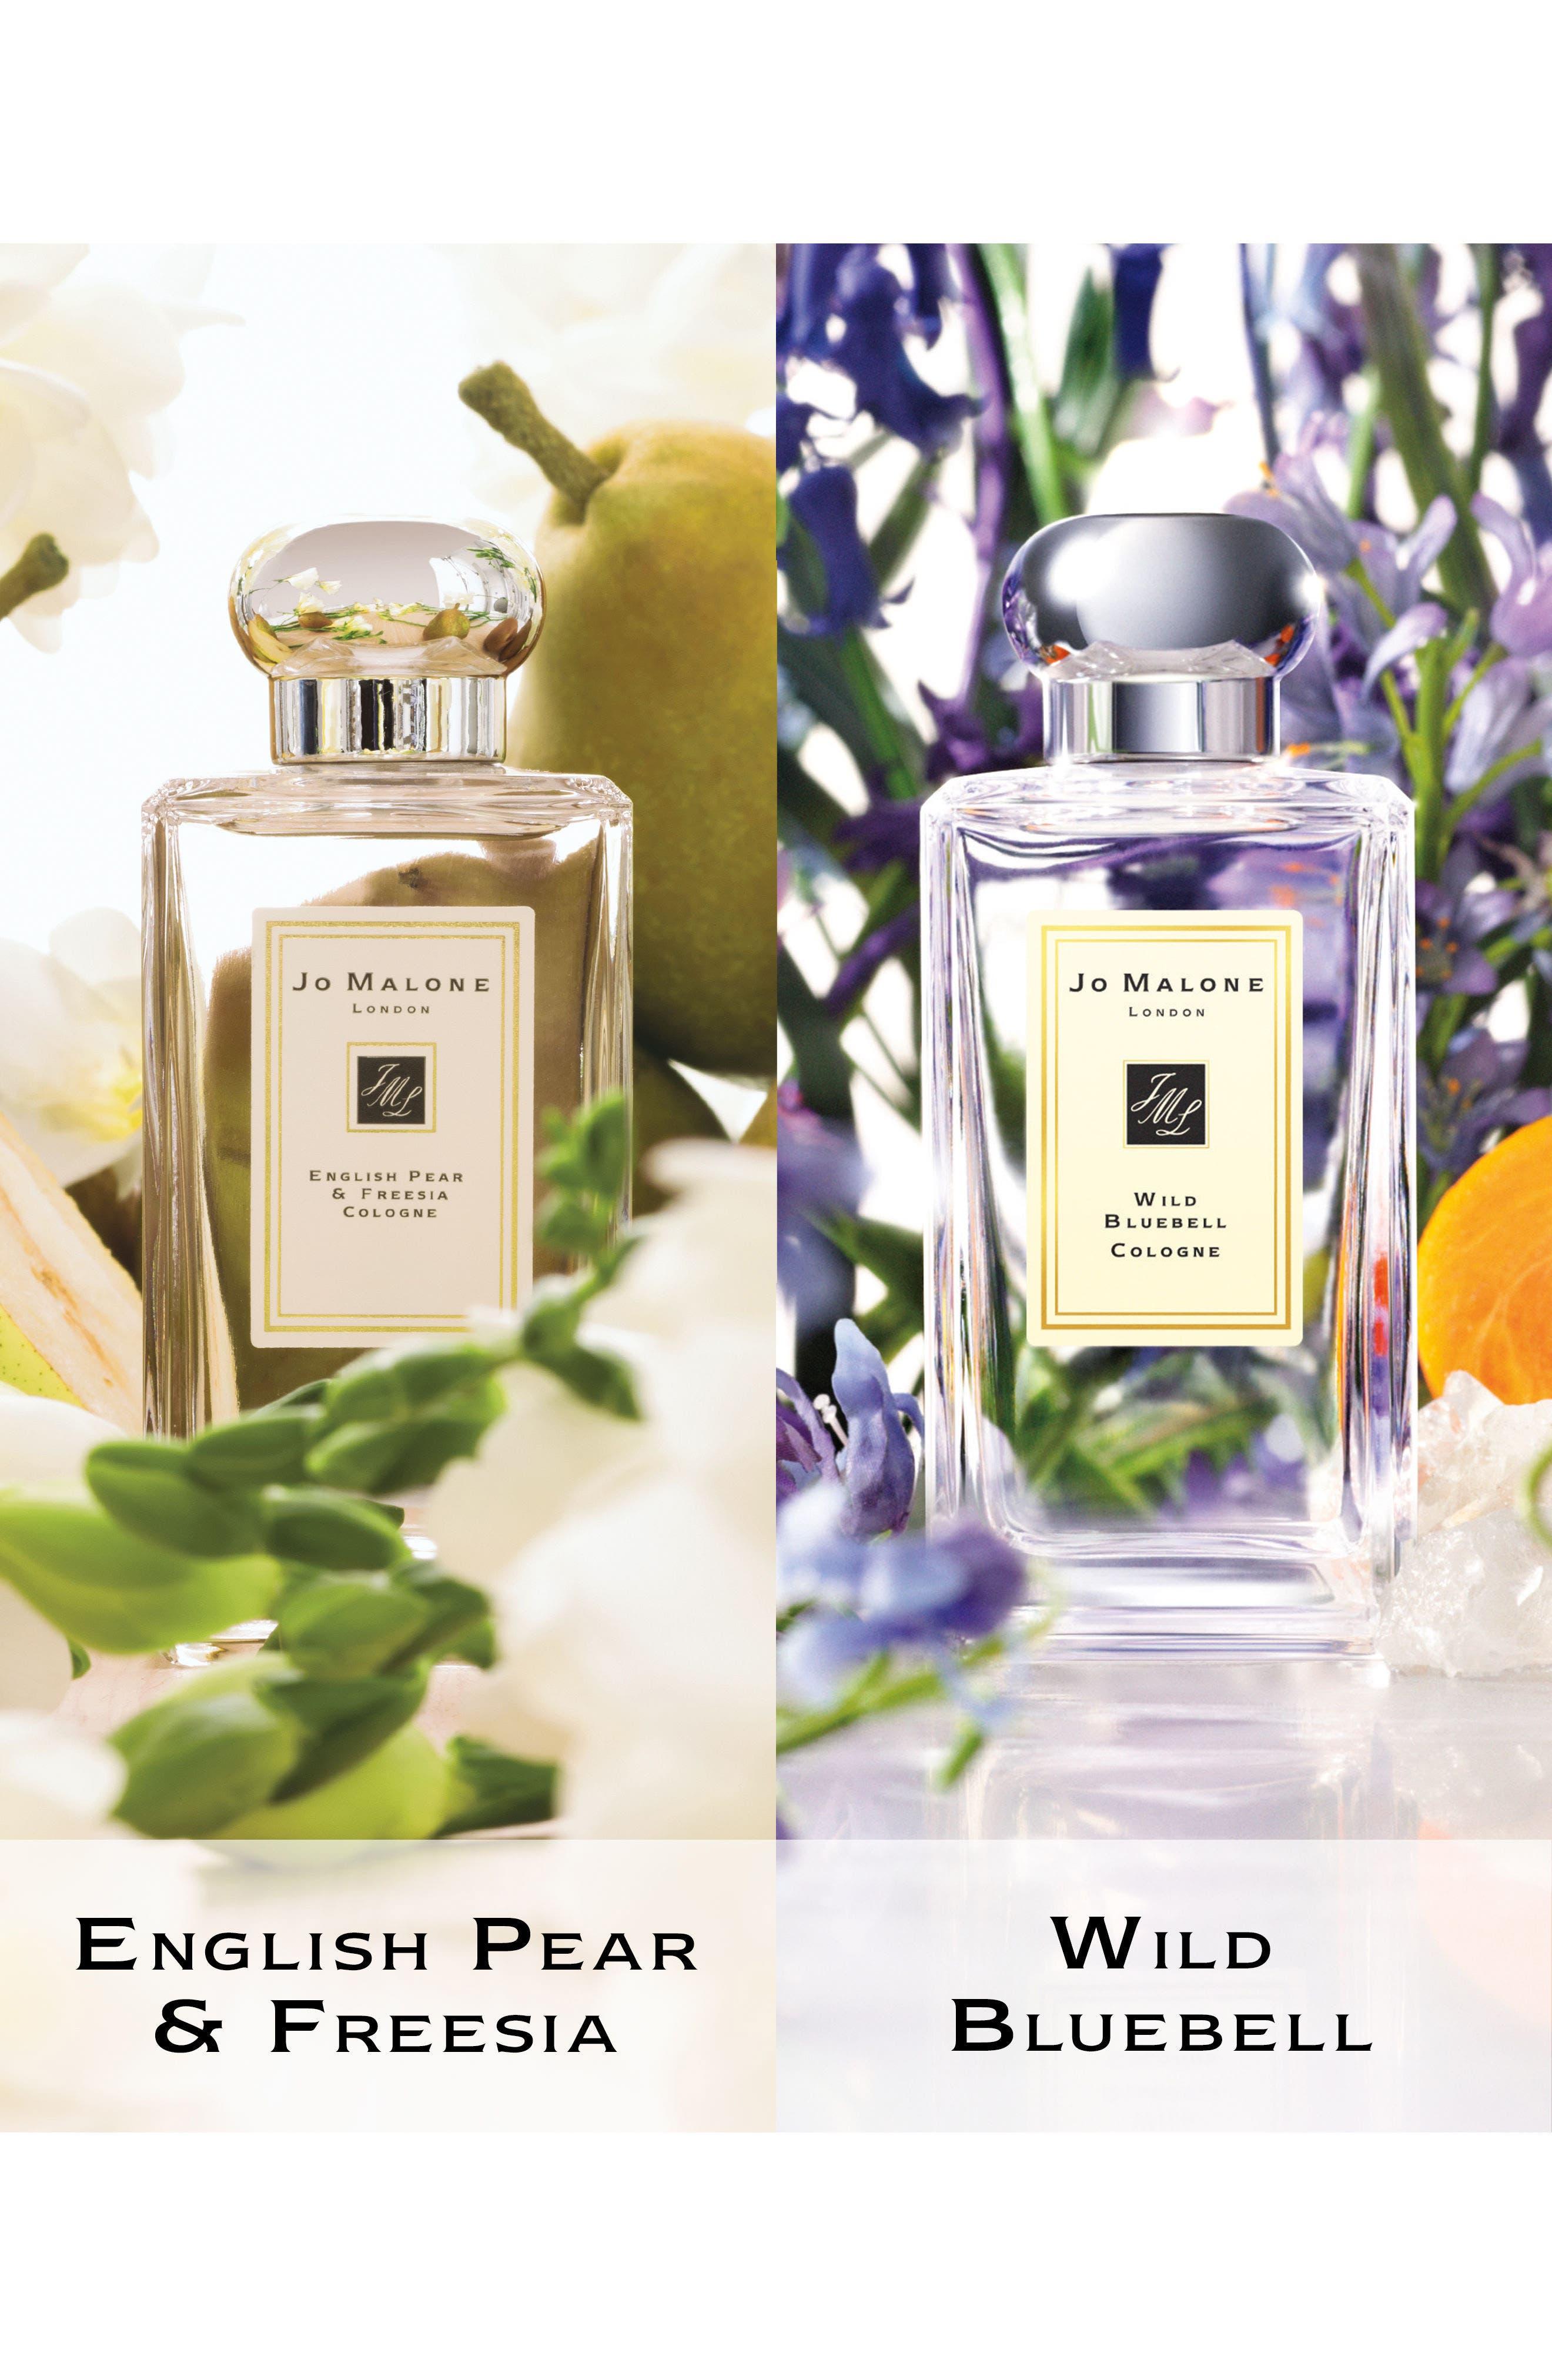 Jo Malone London™ English Pear & Freesia & Wild Bluebell